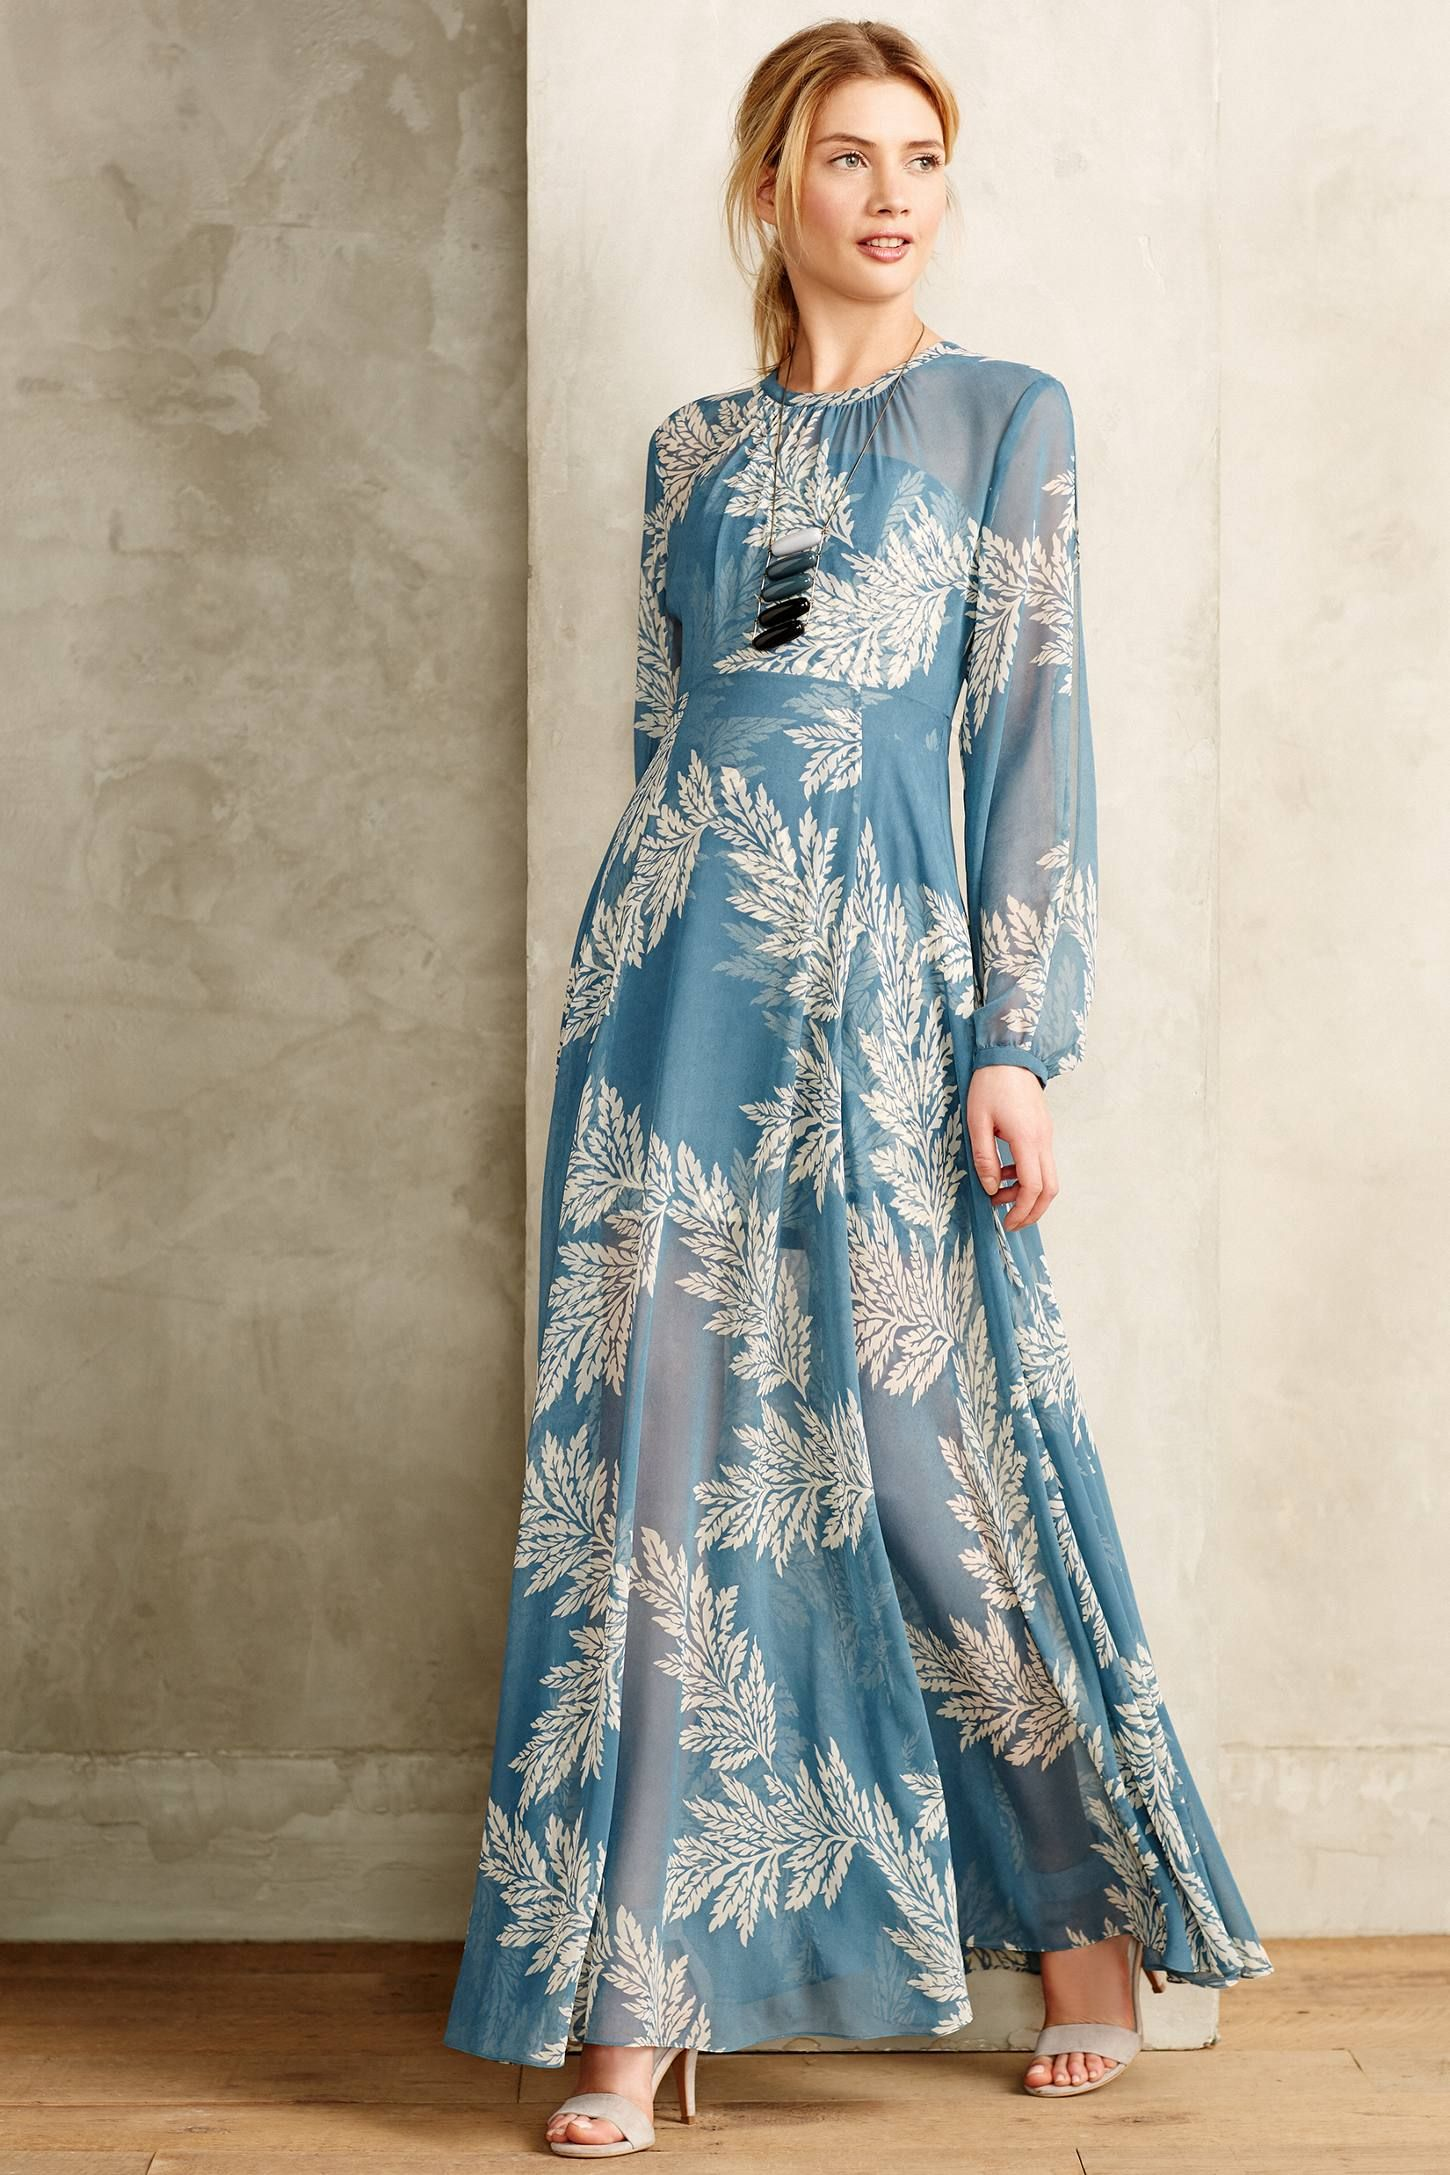 Conservatoire Dress - anthropologie.com   Outfits!   Pinterest ...